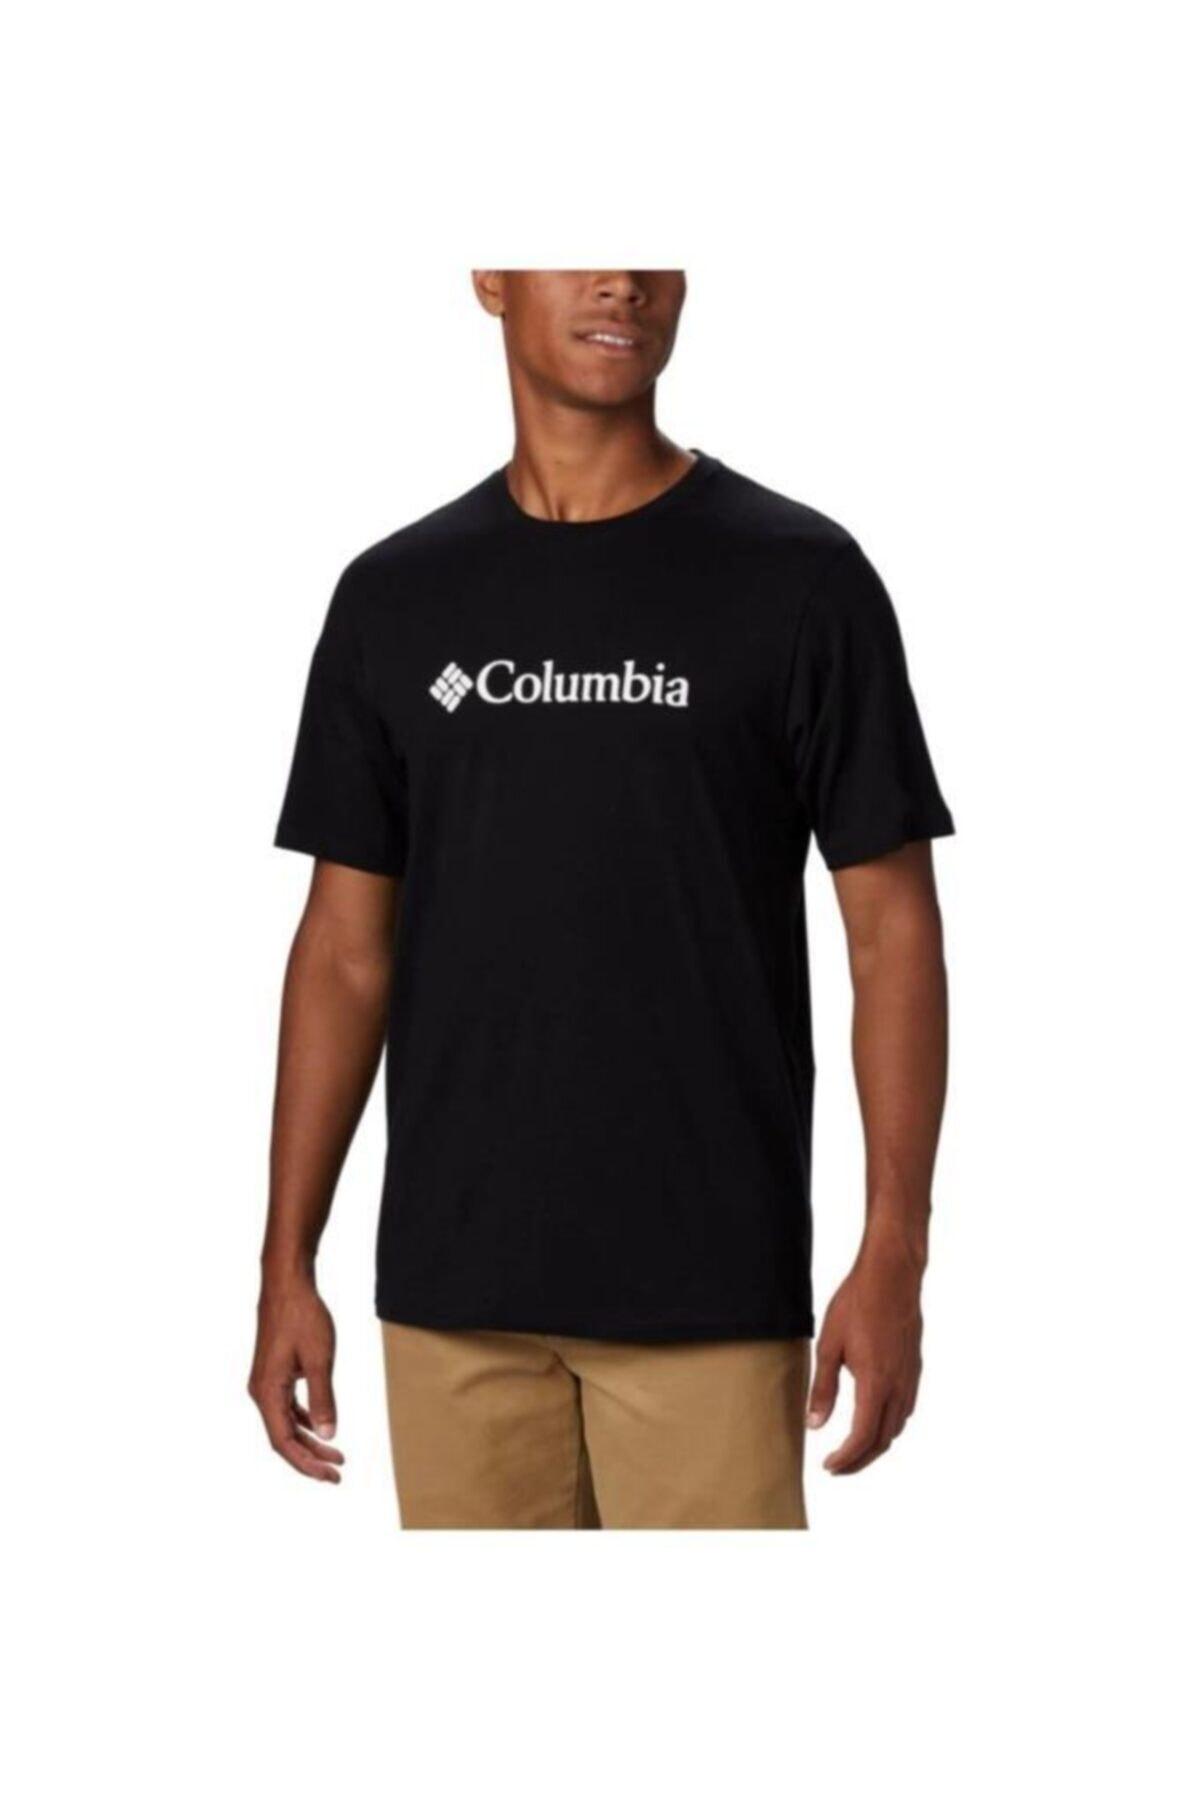 خرید تی شرت غیرحضوری برند کلمبیا رنگ مشکی کد ty98523915